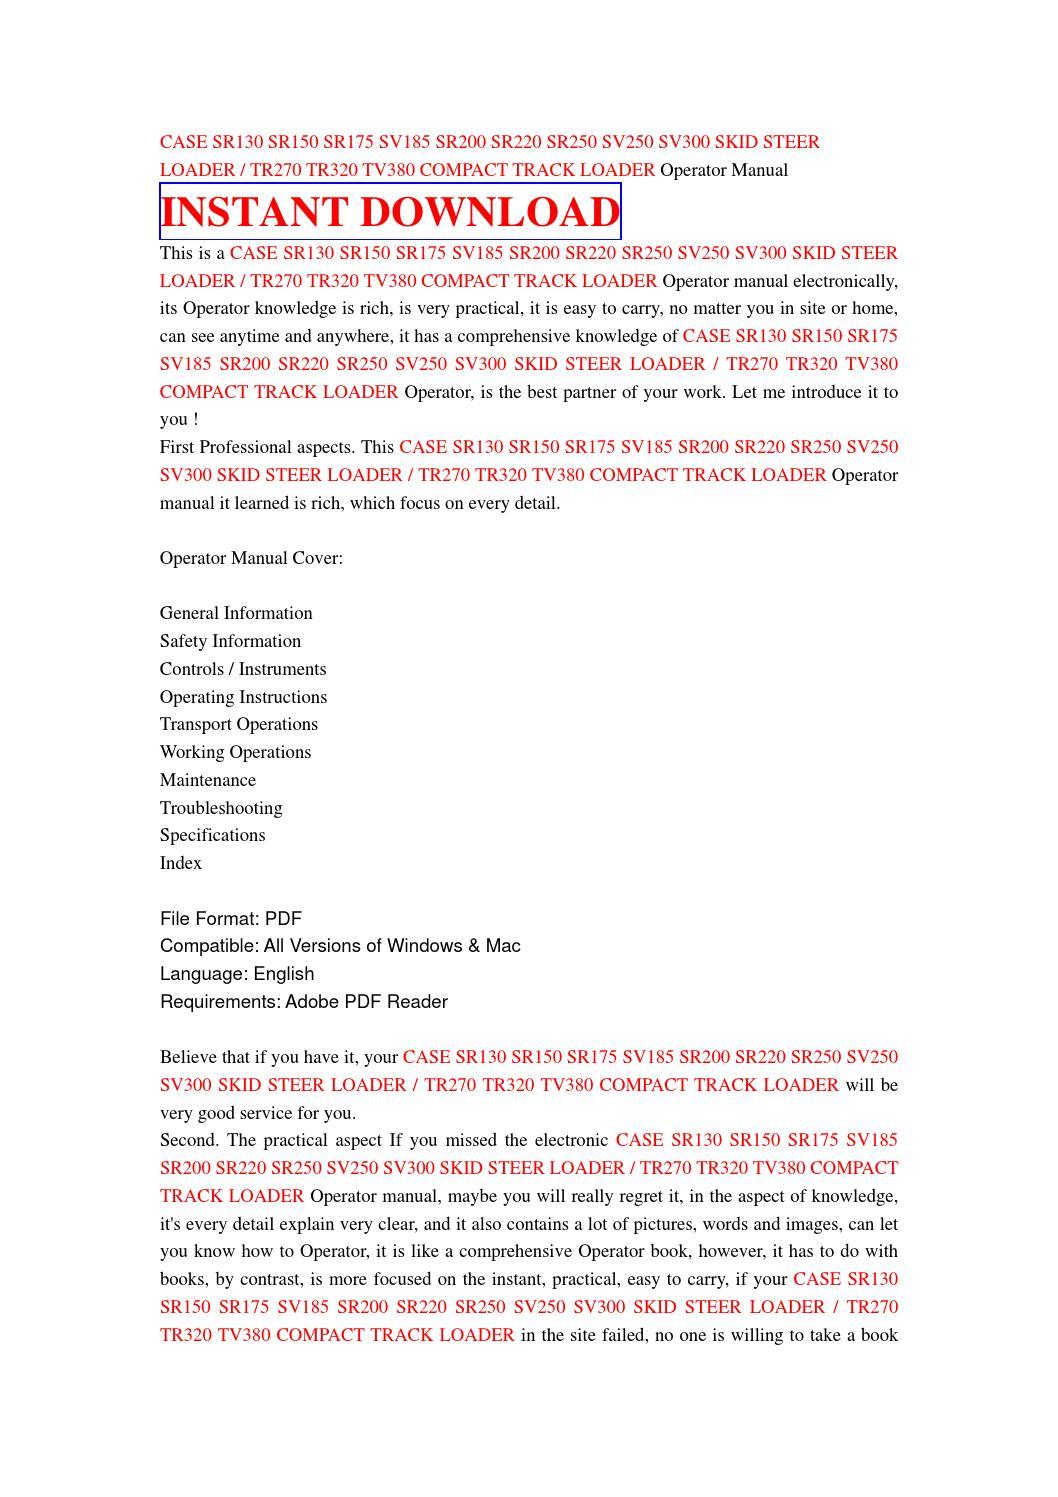 Case sr200 operating manual on case fan diagram, all wheel drive transfer case diagram, gmc truck transfer case diagram, case engine, kubota hydraulics diagram, bobcat 310 parts diagram, case flow diagram, case pump diagram, case parts diagram, case transmission diagram,